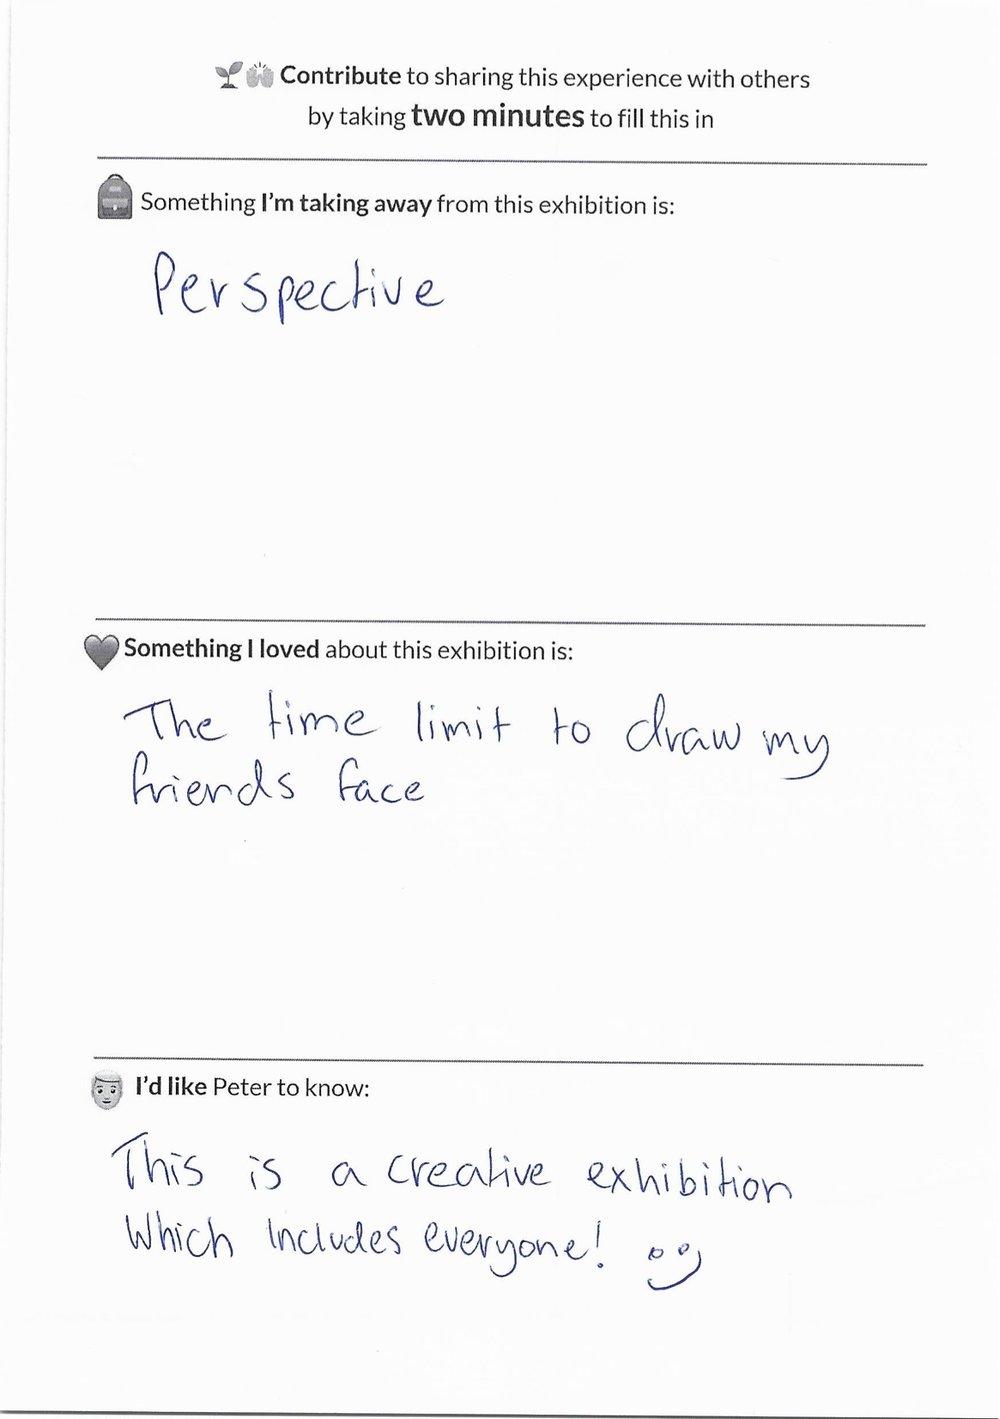 Drawn-in reflections-065.jpg